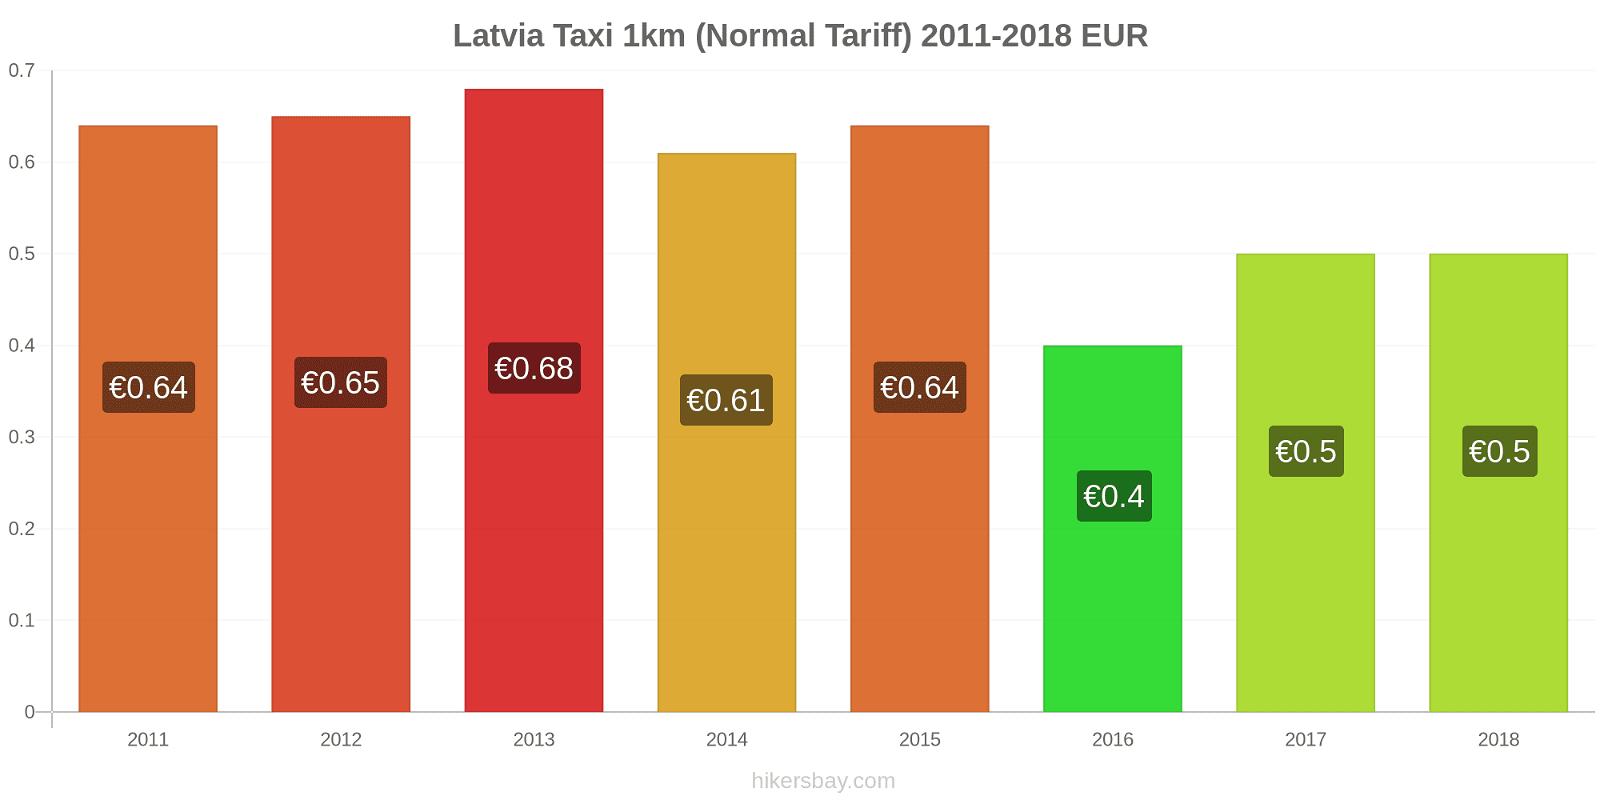 Latvia price changes Taxi 1km (Normal Tariff) hikersbay.com